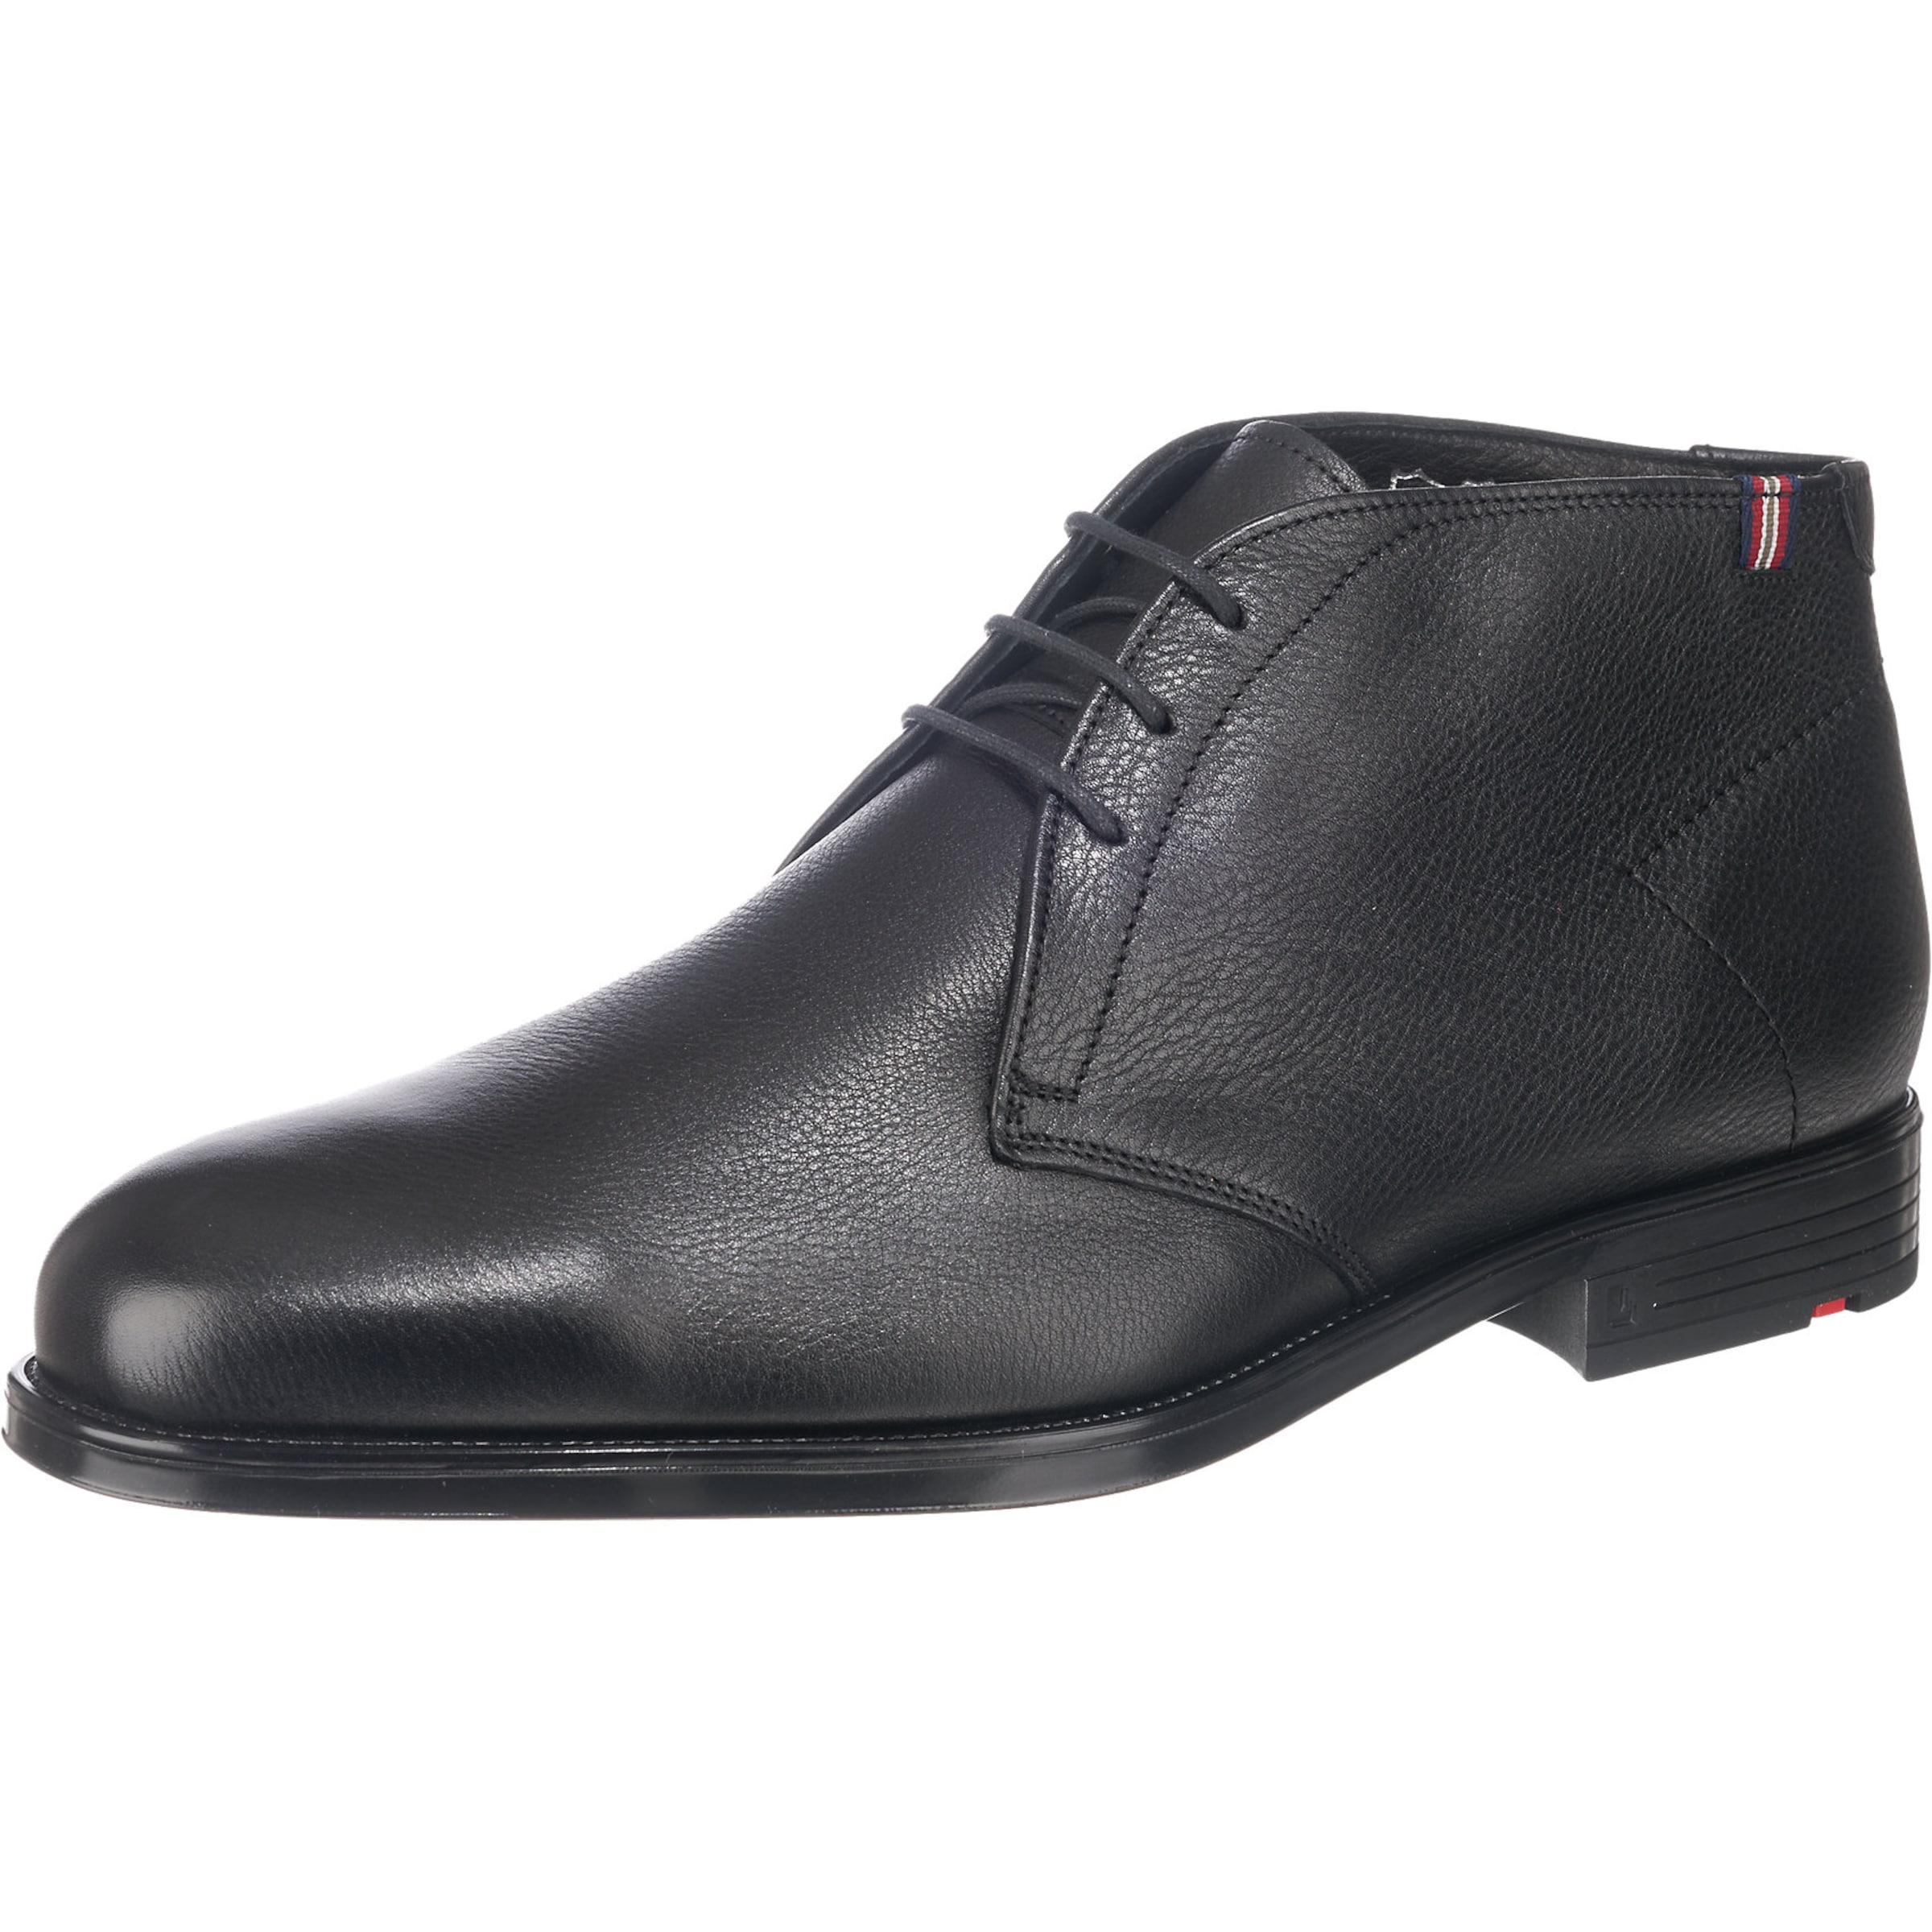 Haltbare Mode billige Schuhe LLOYD | 'Parry' Stiefeletten Schuhe Gut getragene Schuhe